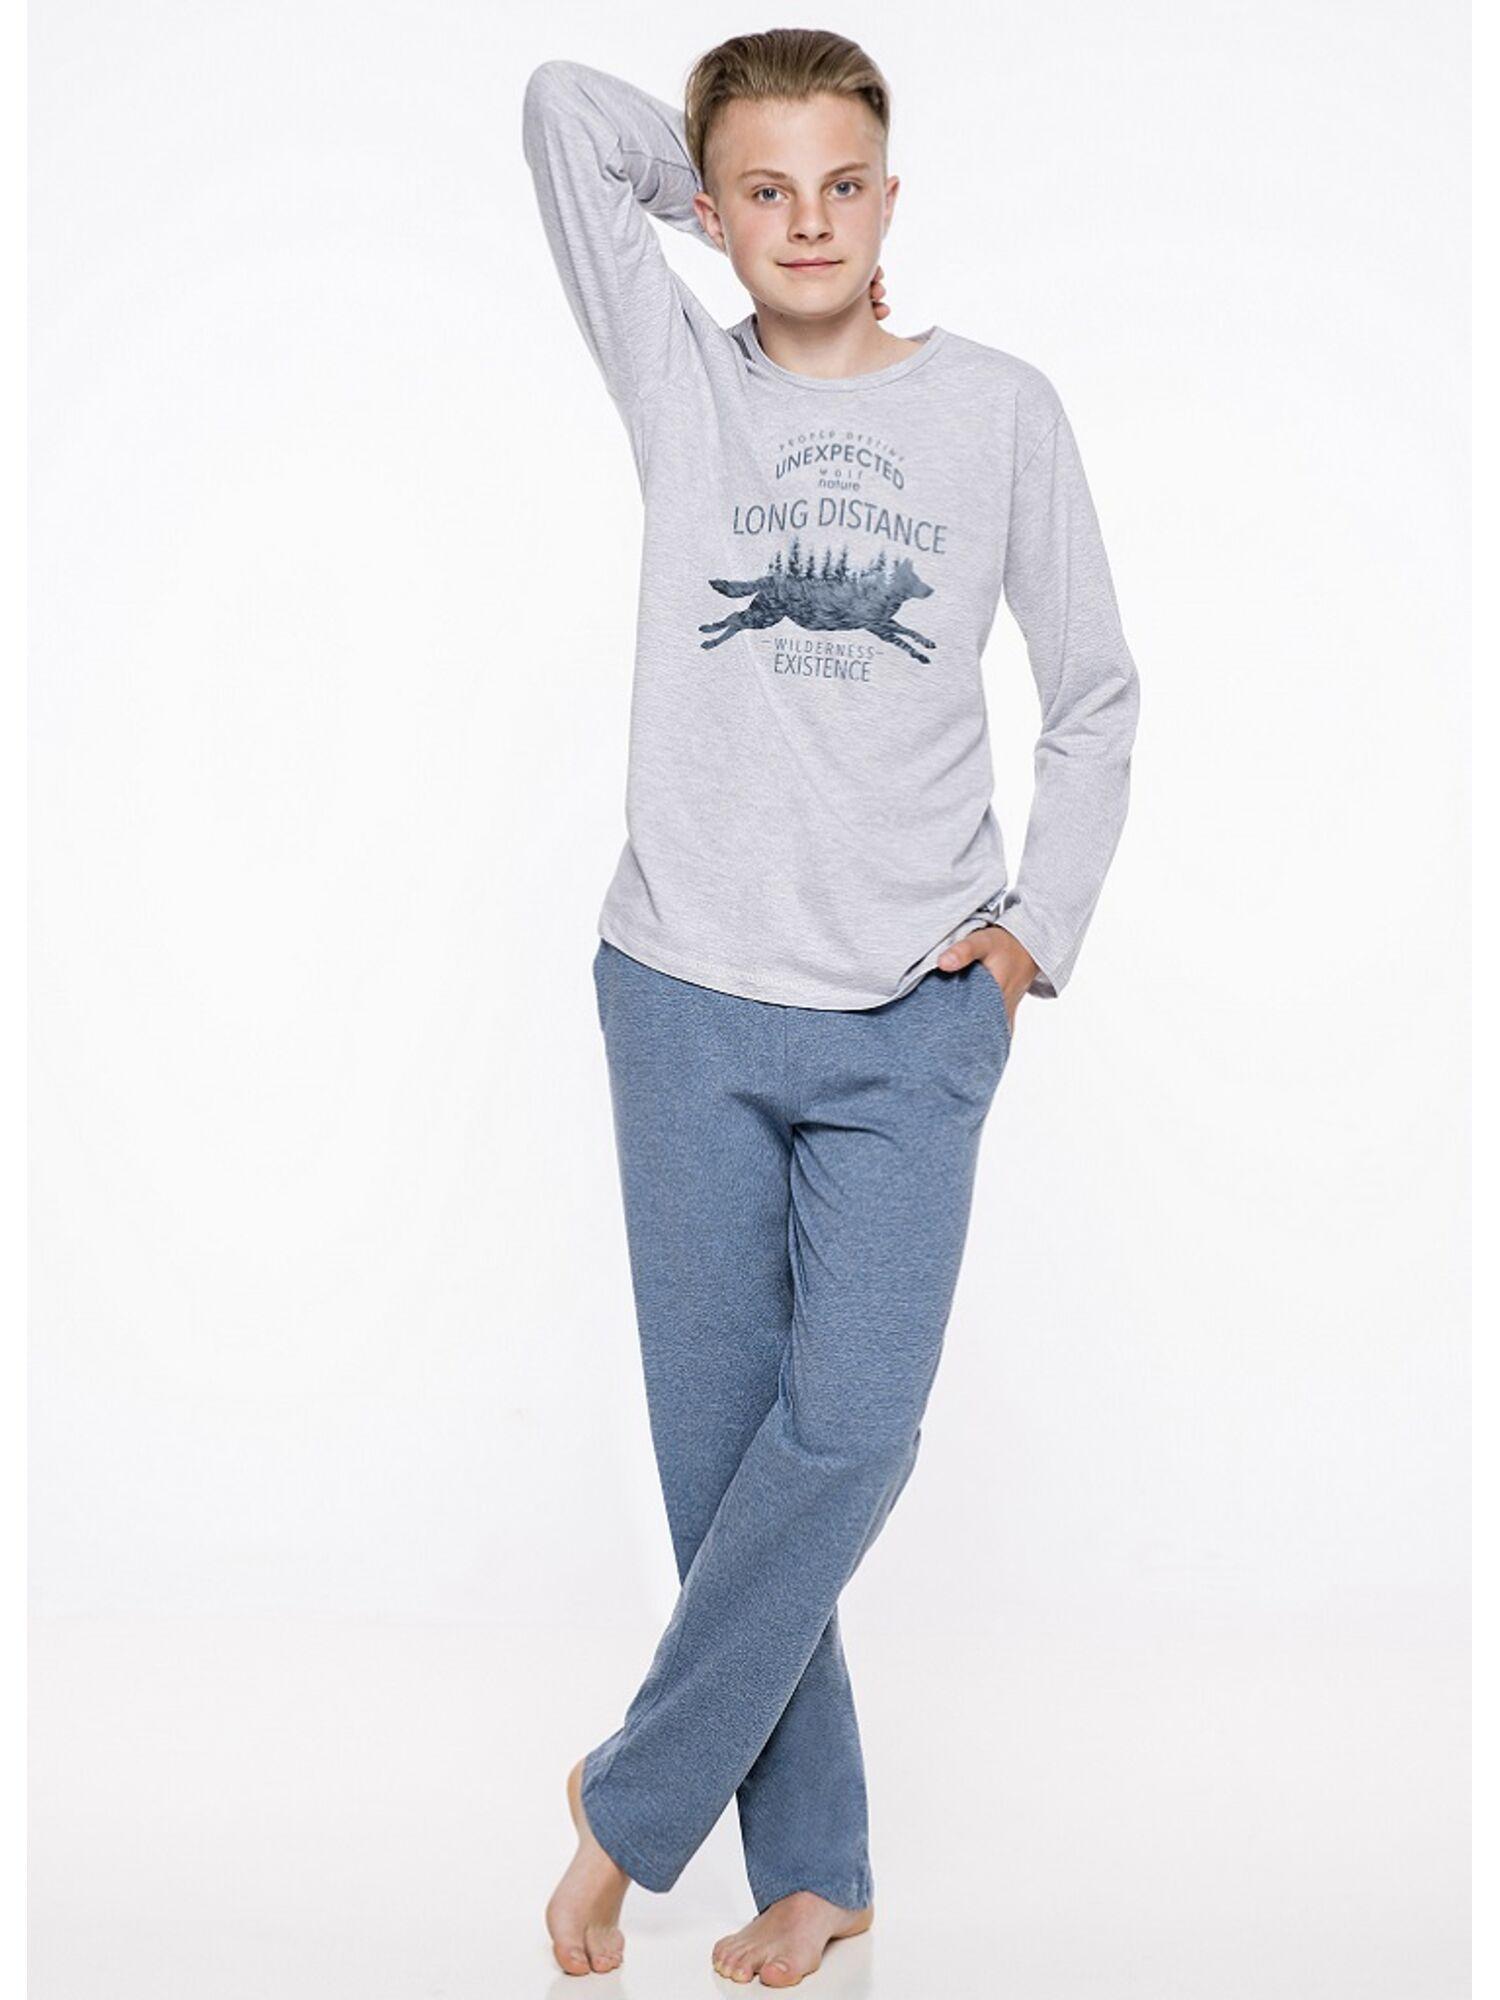 Пижама подростковая для мальчика 1175 19/20 KAROL серый/синий, Taro